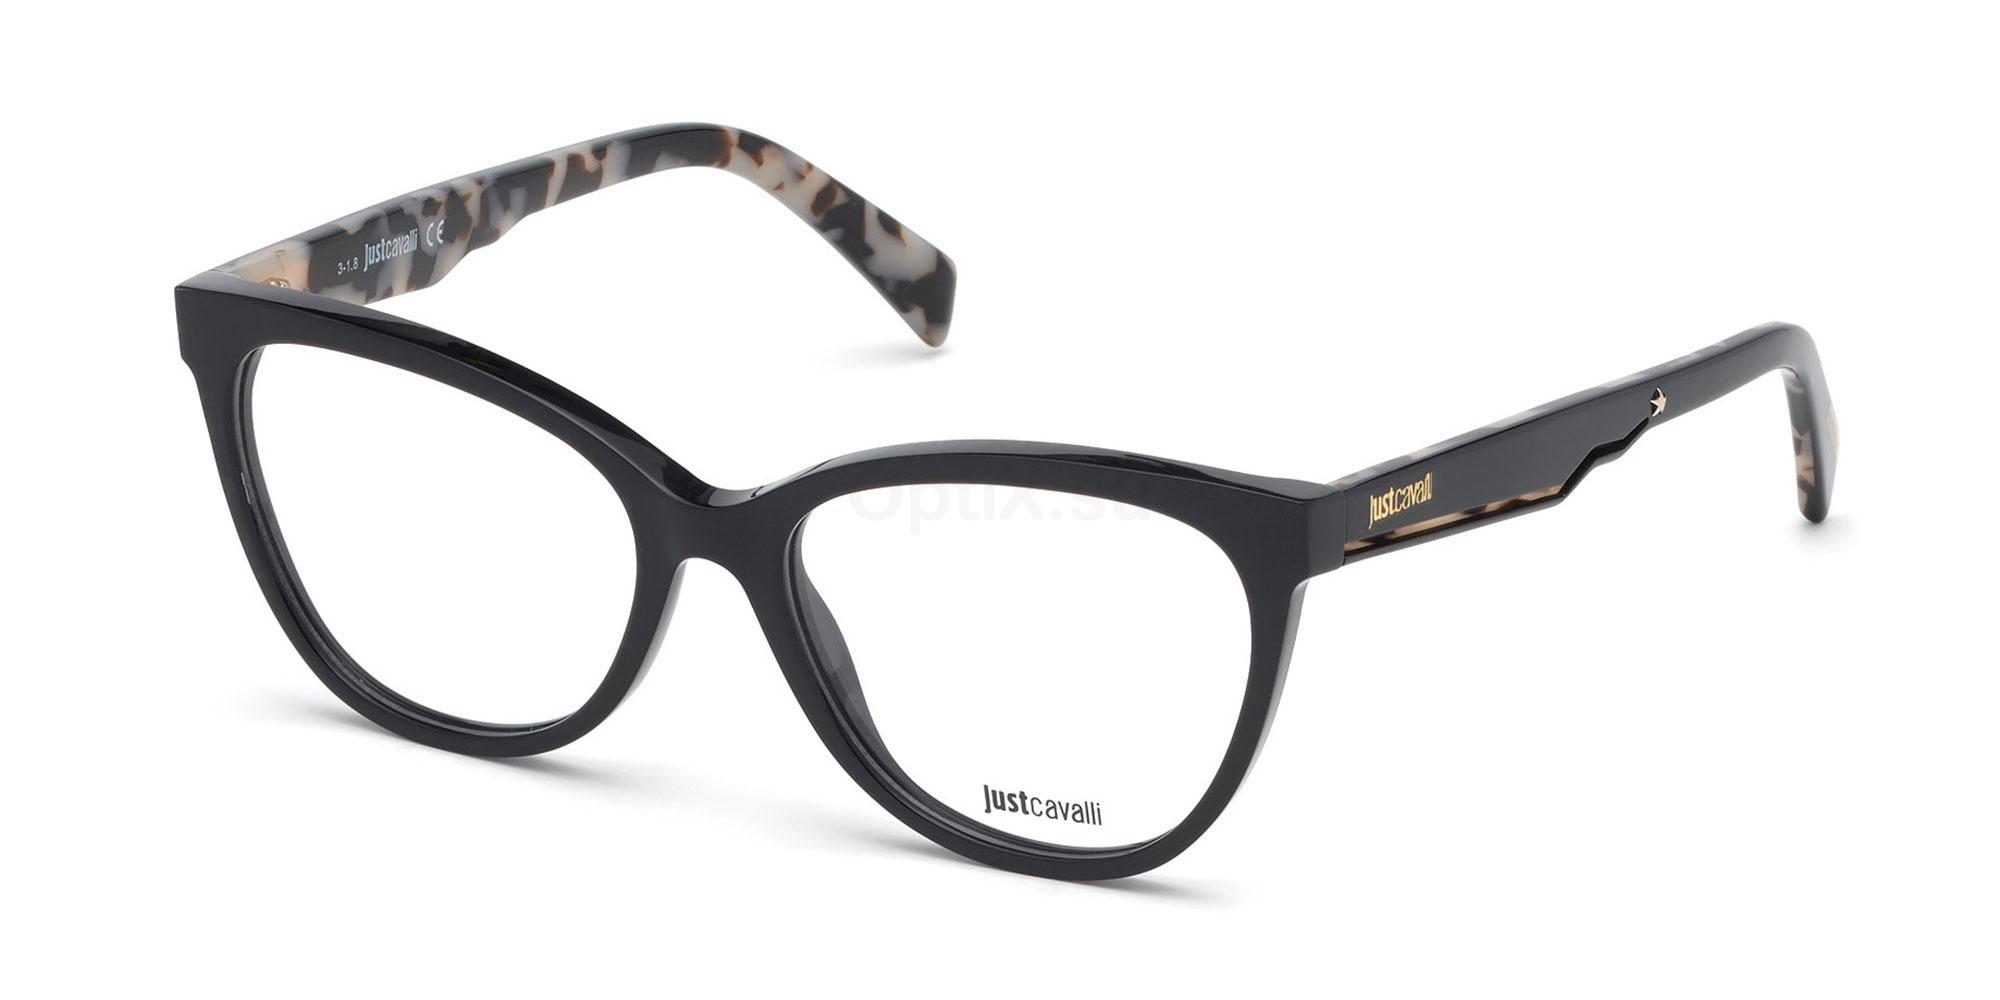 001 JC0876 Glasses, Just Cavalli